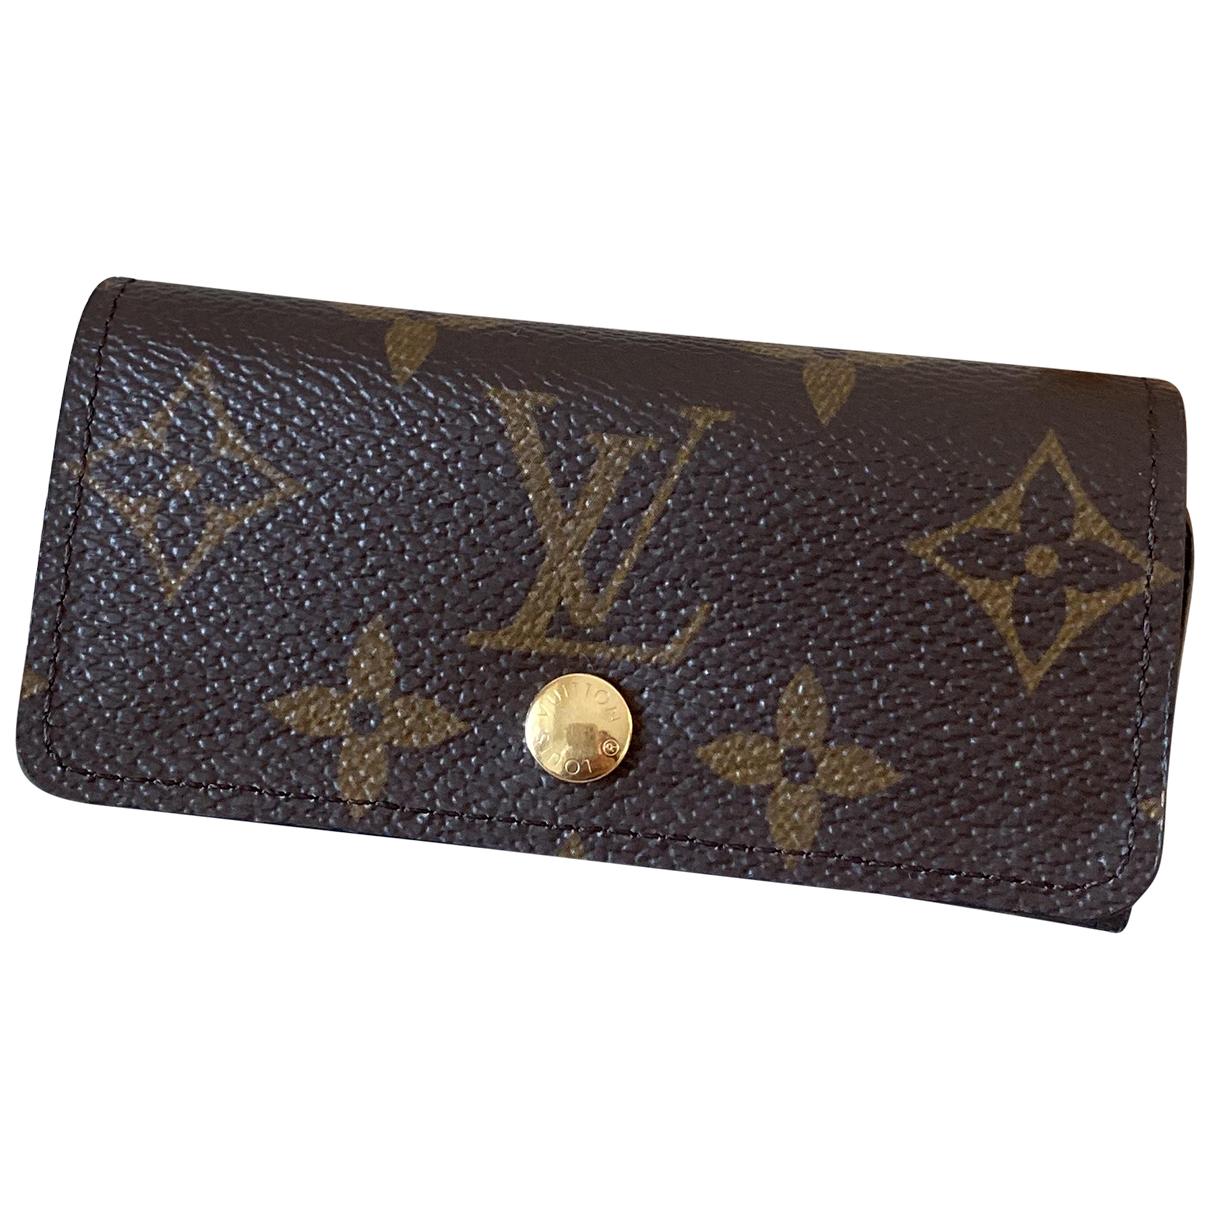 Llavero de Lona Louis Vuitton